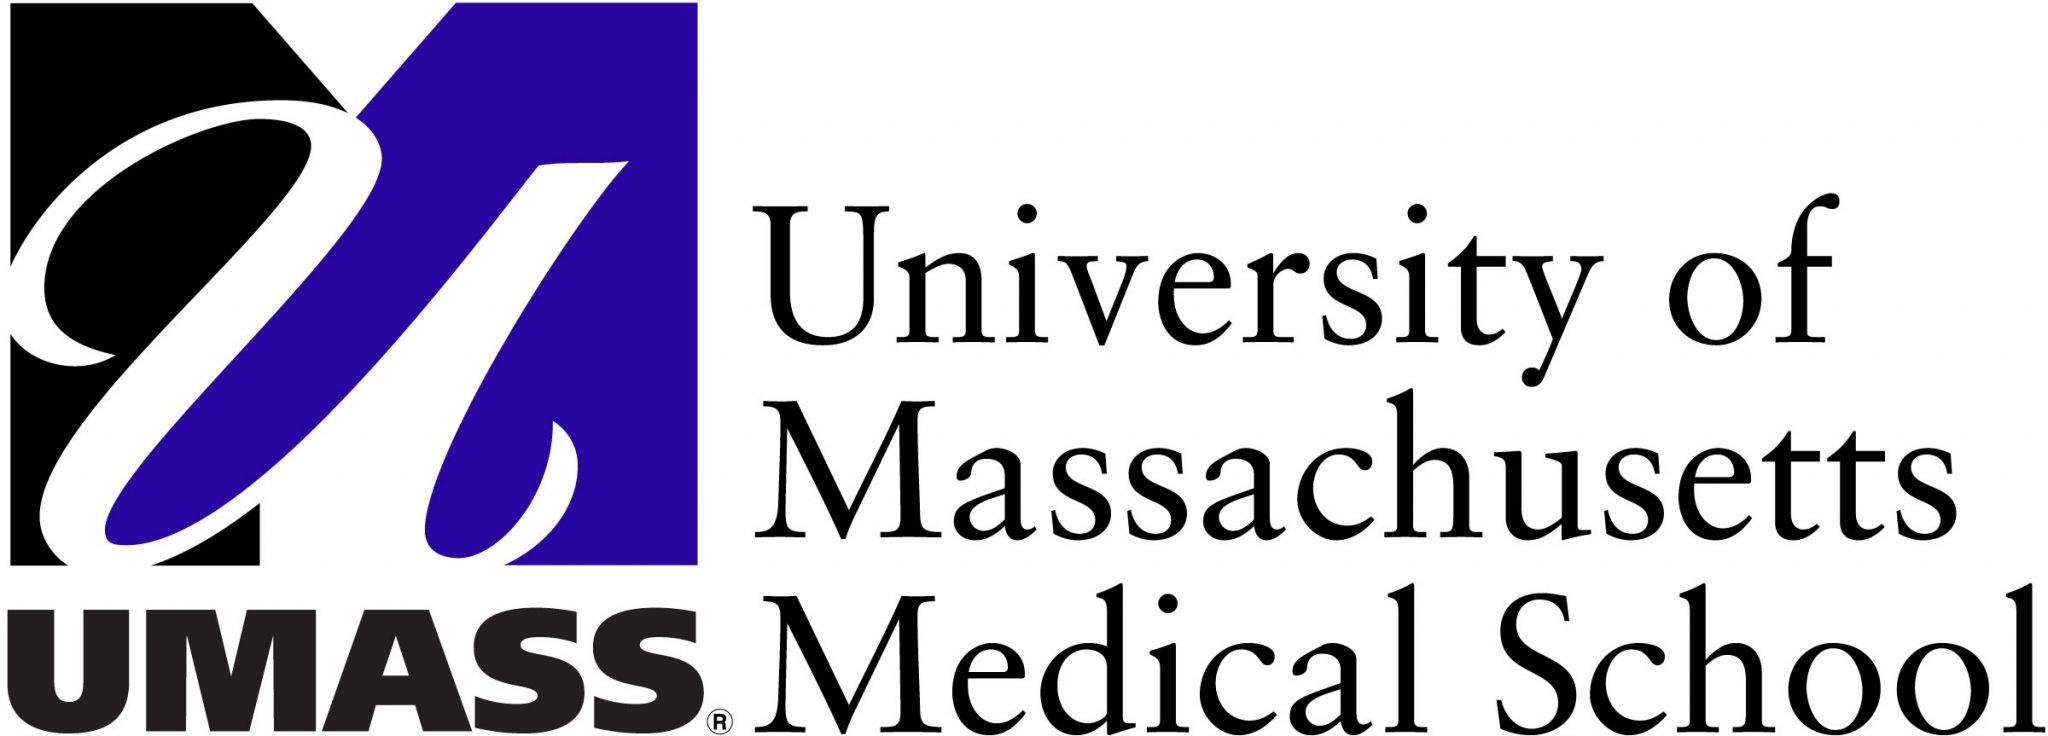 University of Massachusetts Medical School Secondary Essay